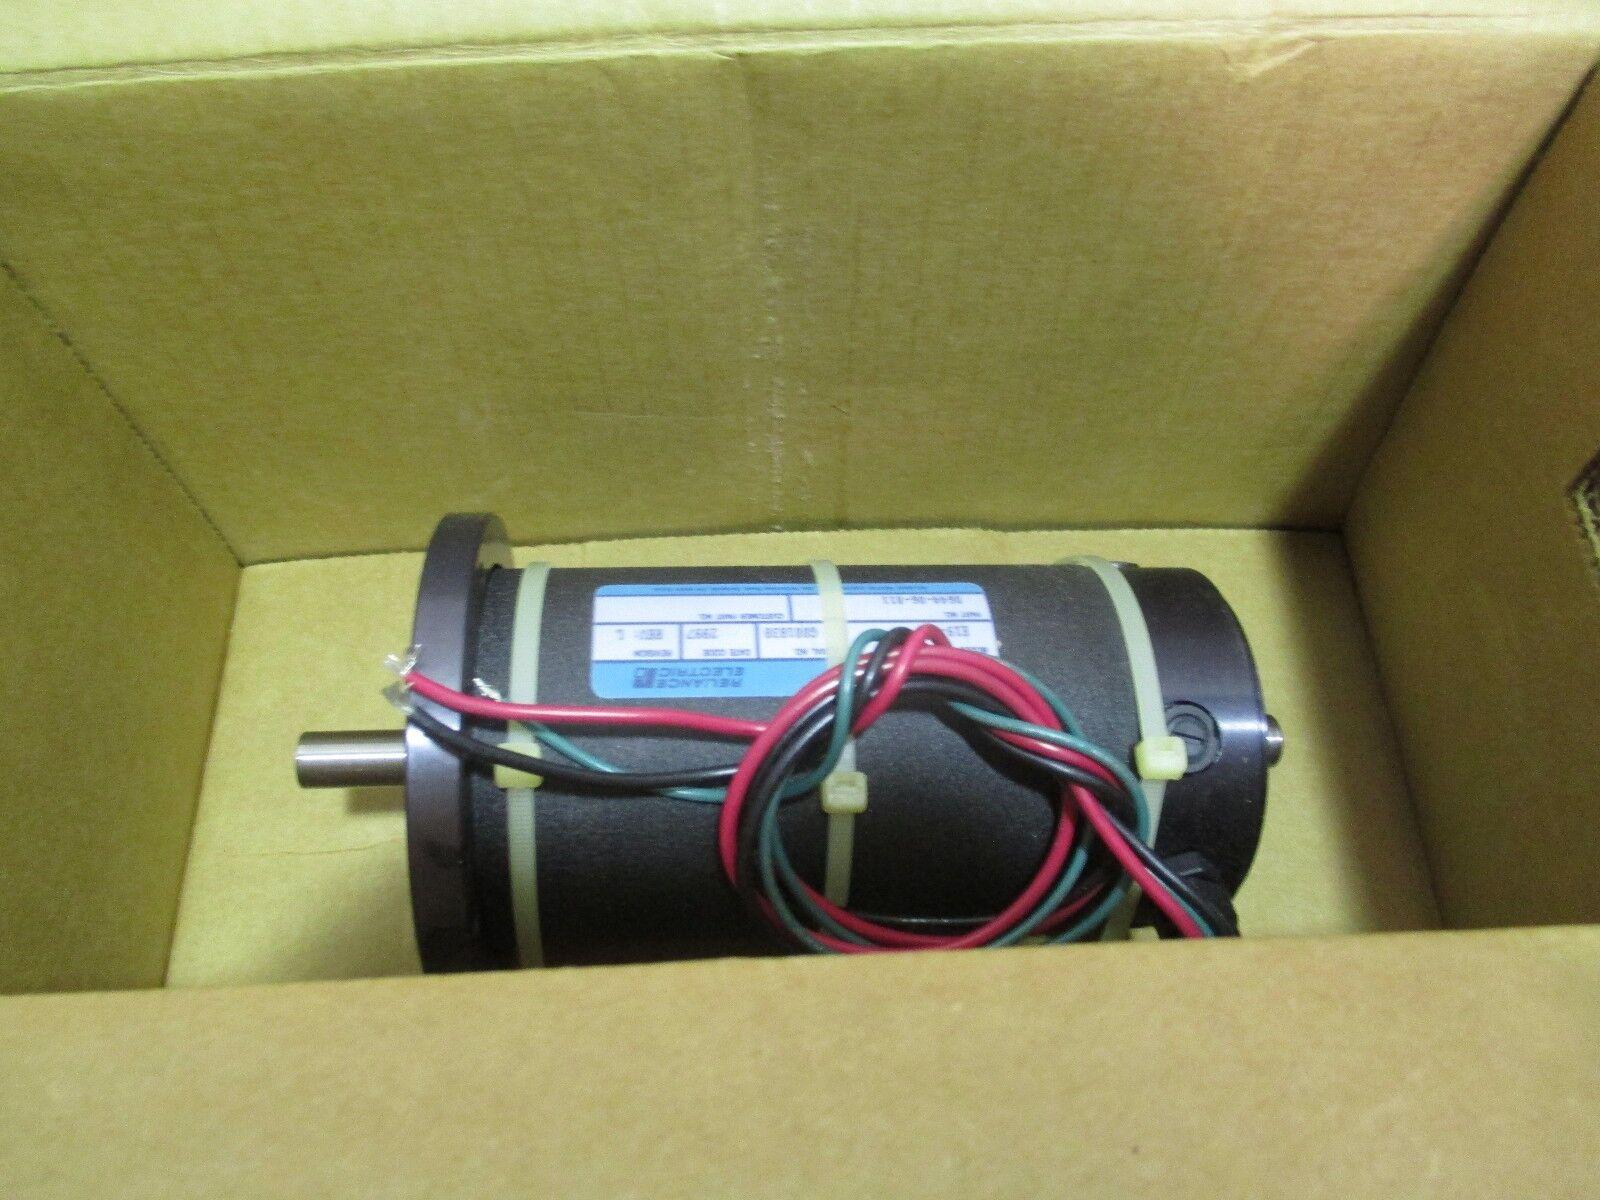 Reliance Electric 0644-06-011 Electro-craft Servo Motor, Model E19-3, 420974